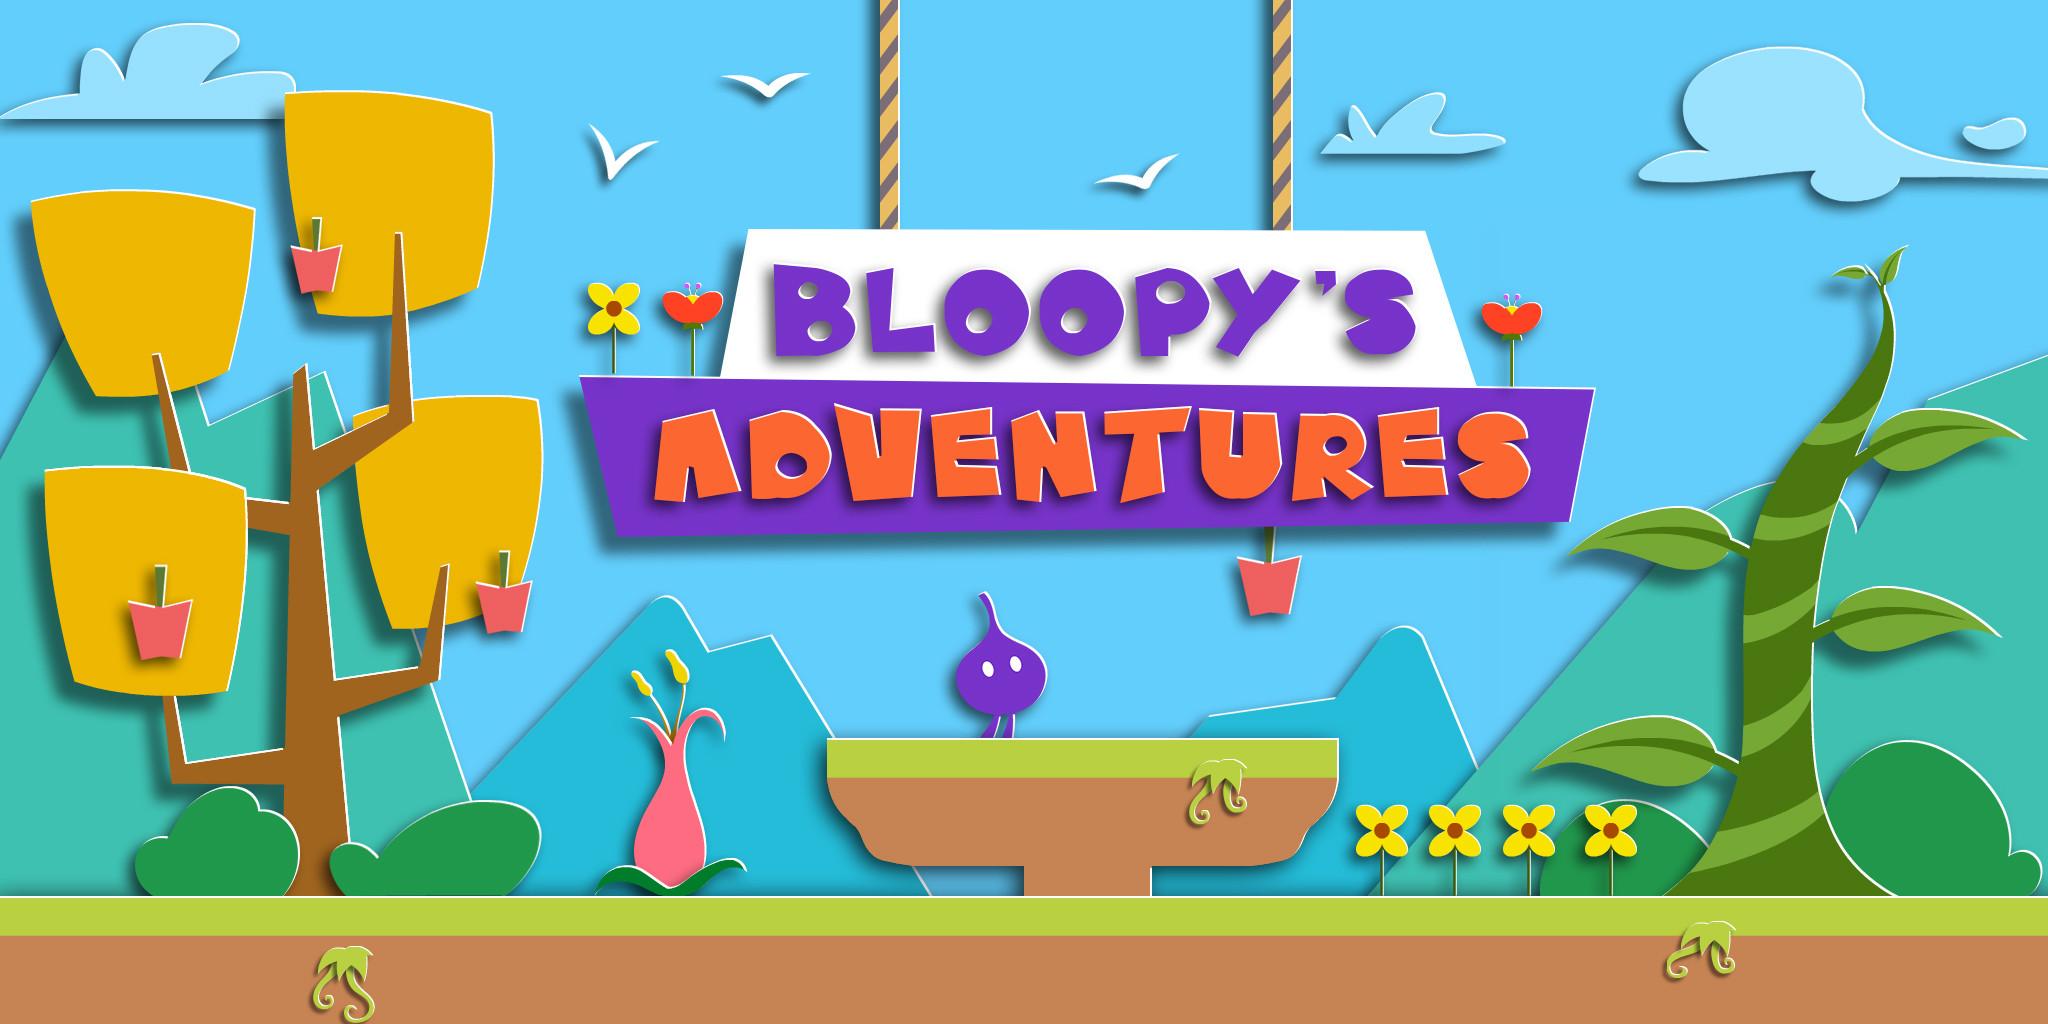 Bloopy's Adventures